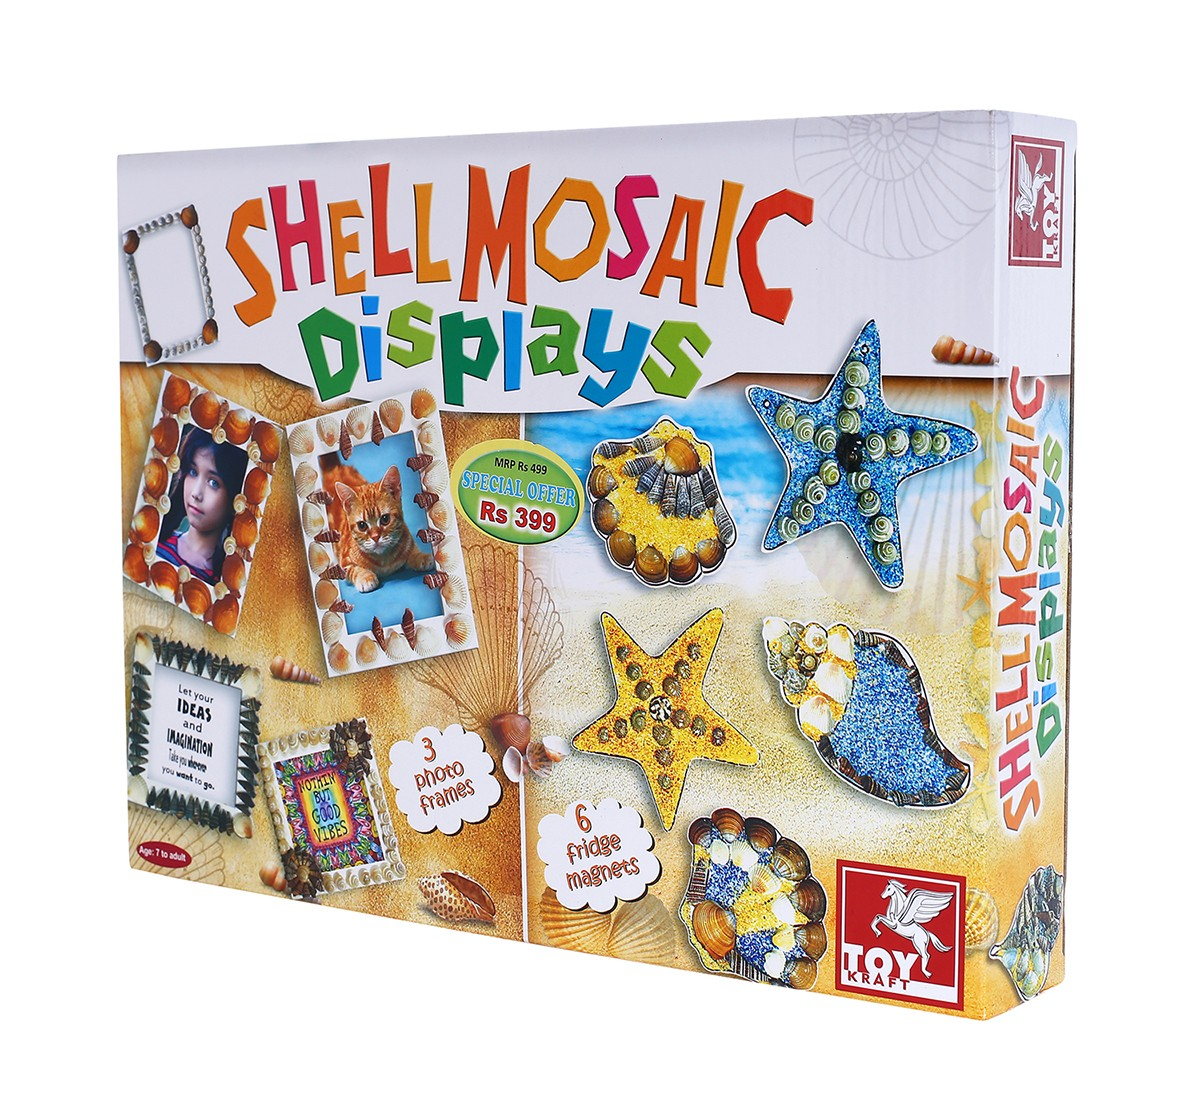 Toy Kraft Shell Mosaic Displays DIY Art & Craft Kits for Kids age 7Y+